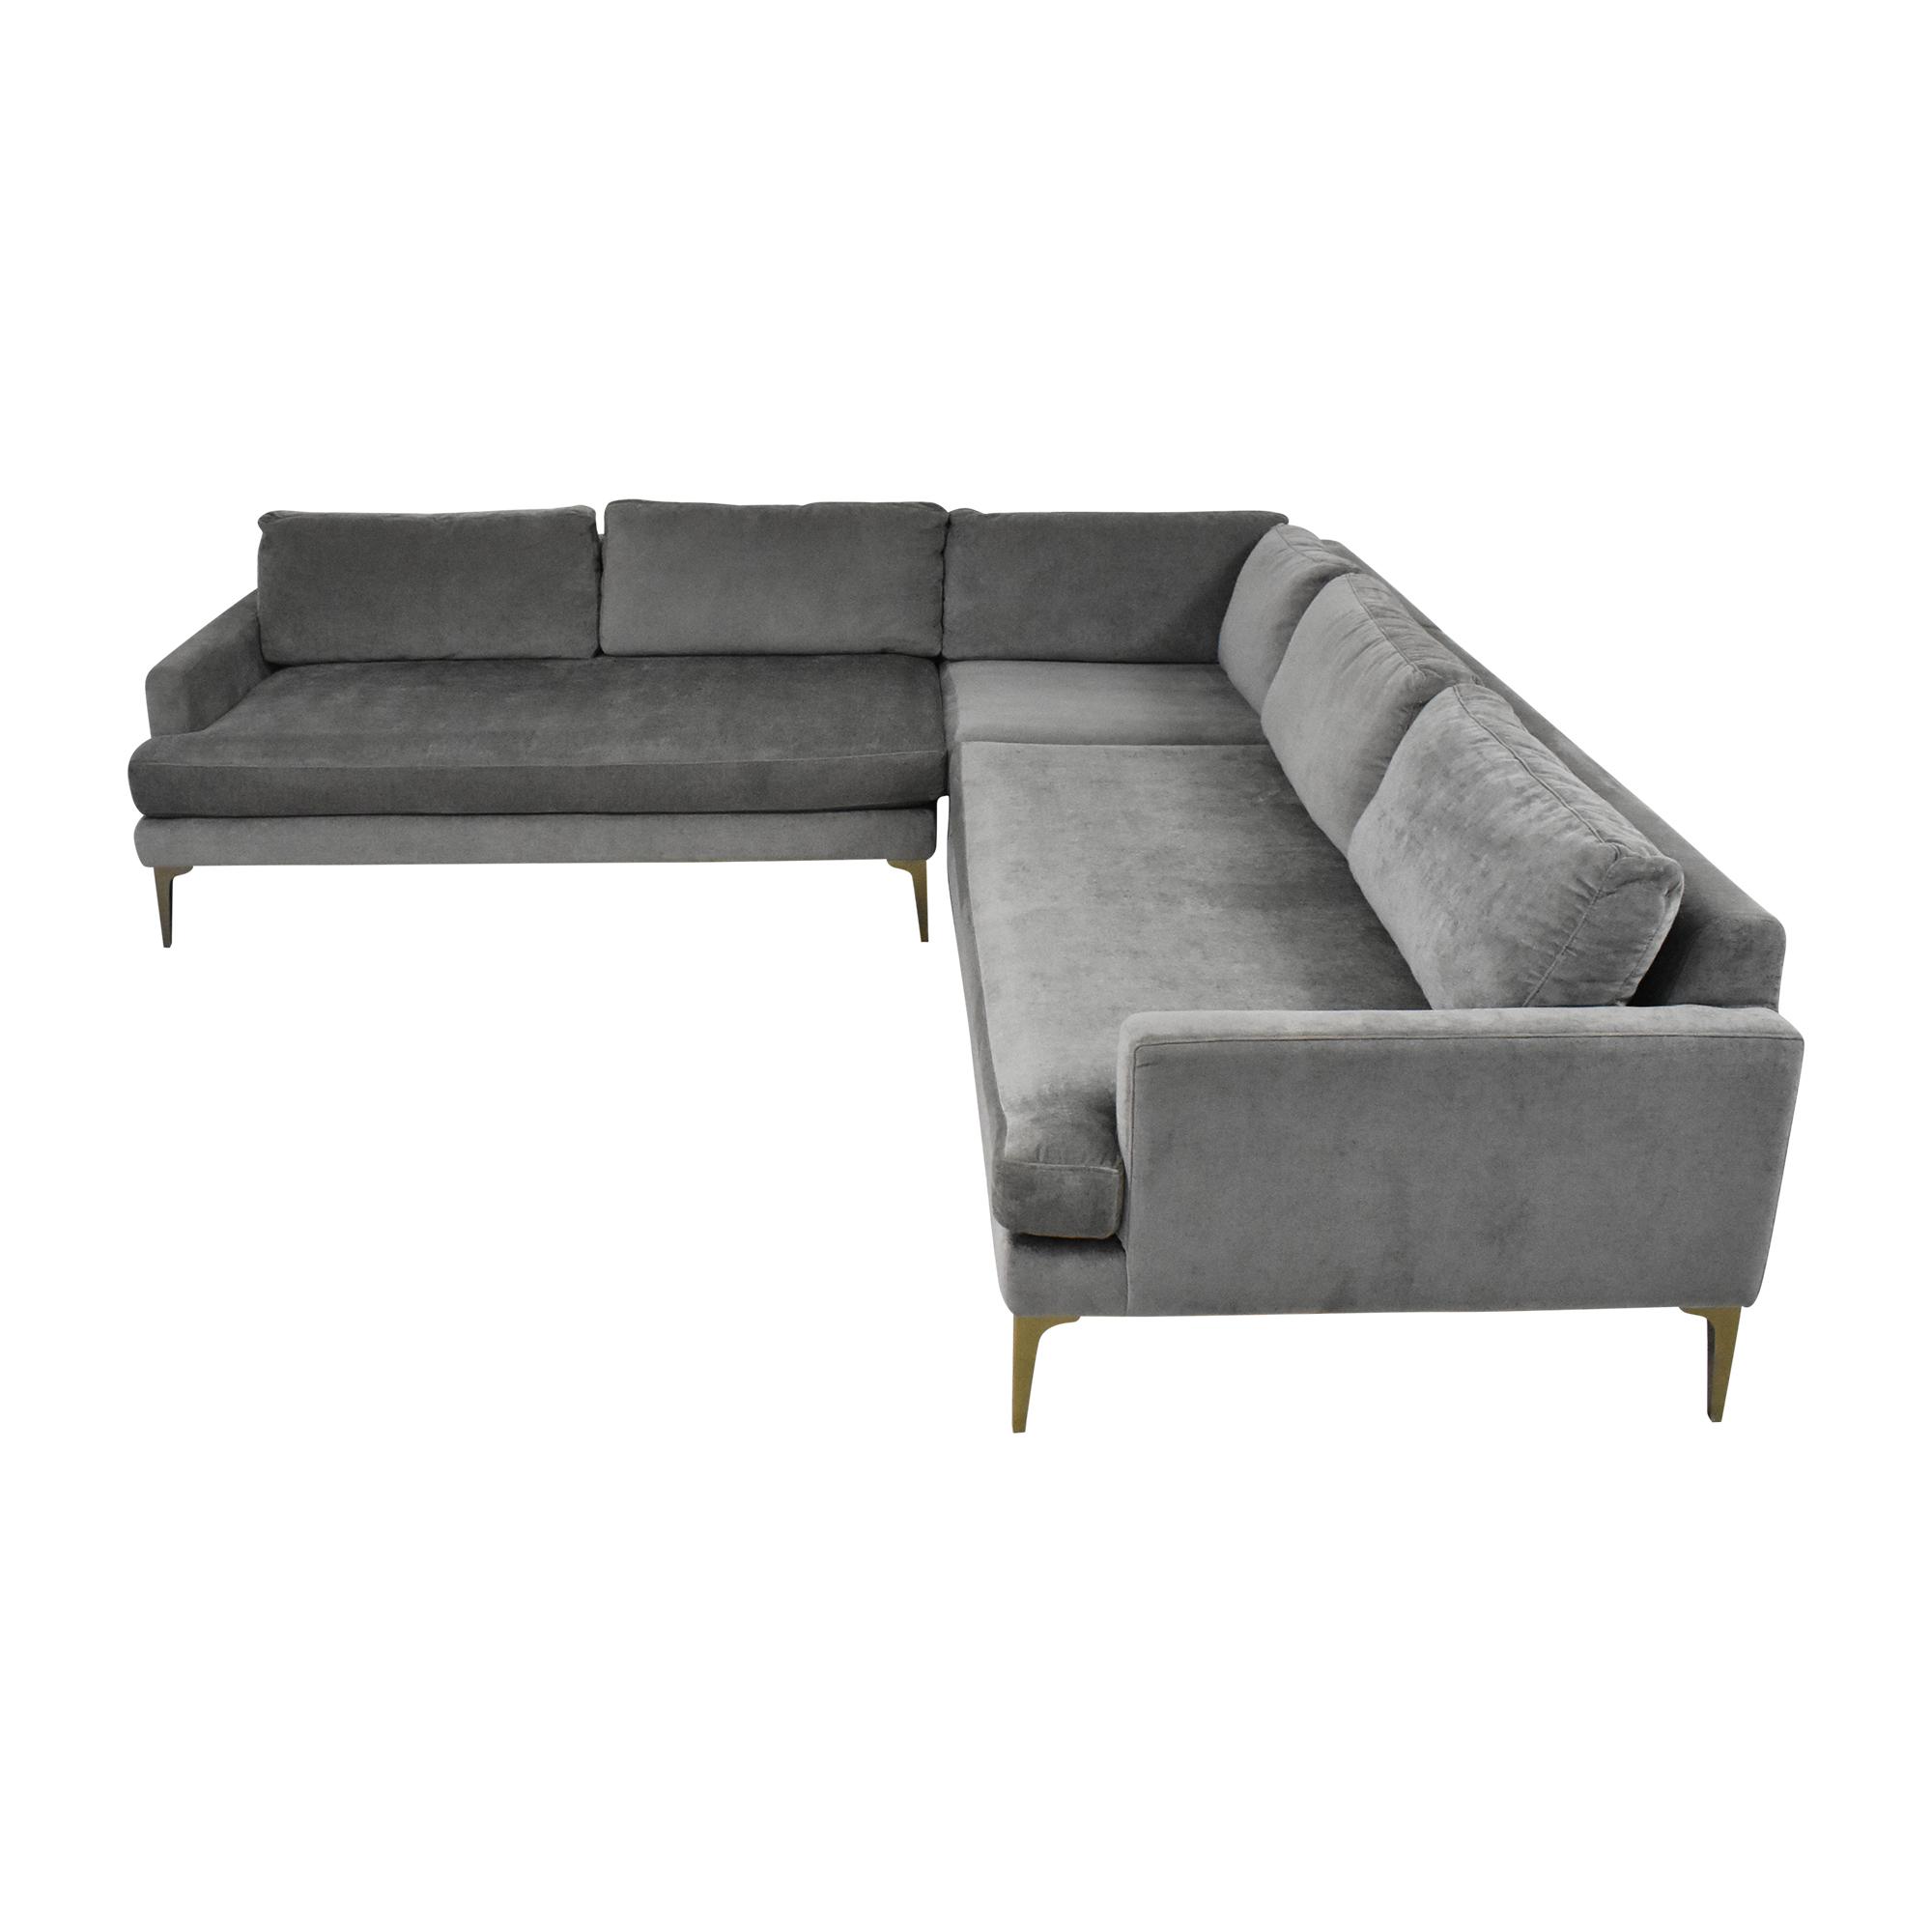 shop West Elm West Elm Andes Three Piece L Shaped Sectional Sofa online